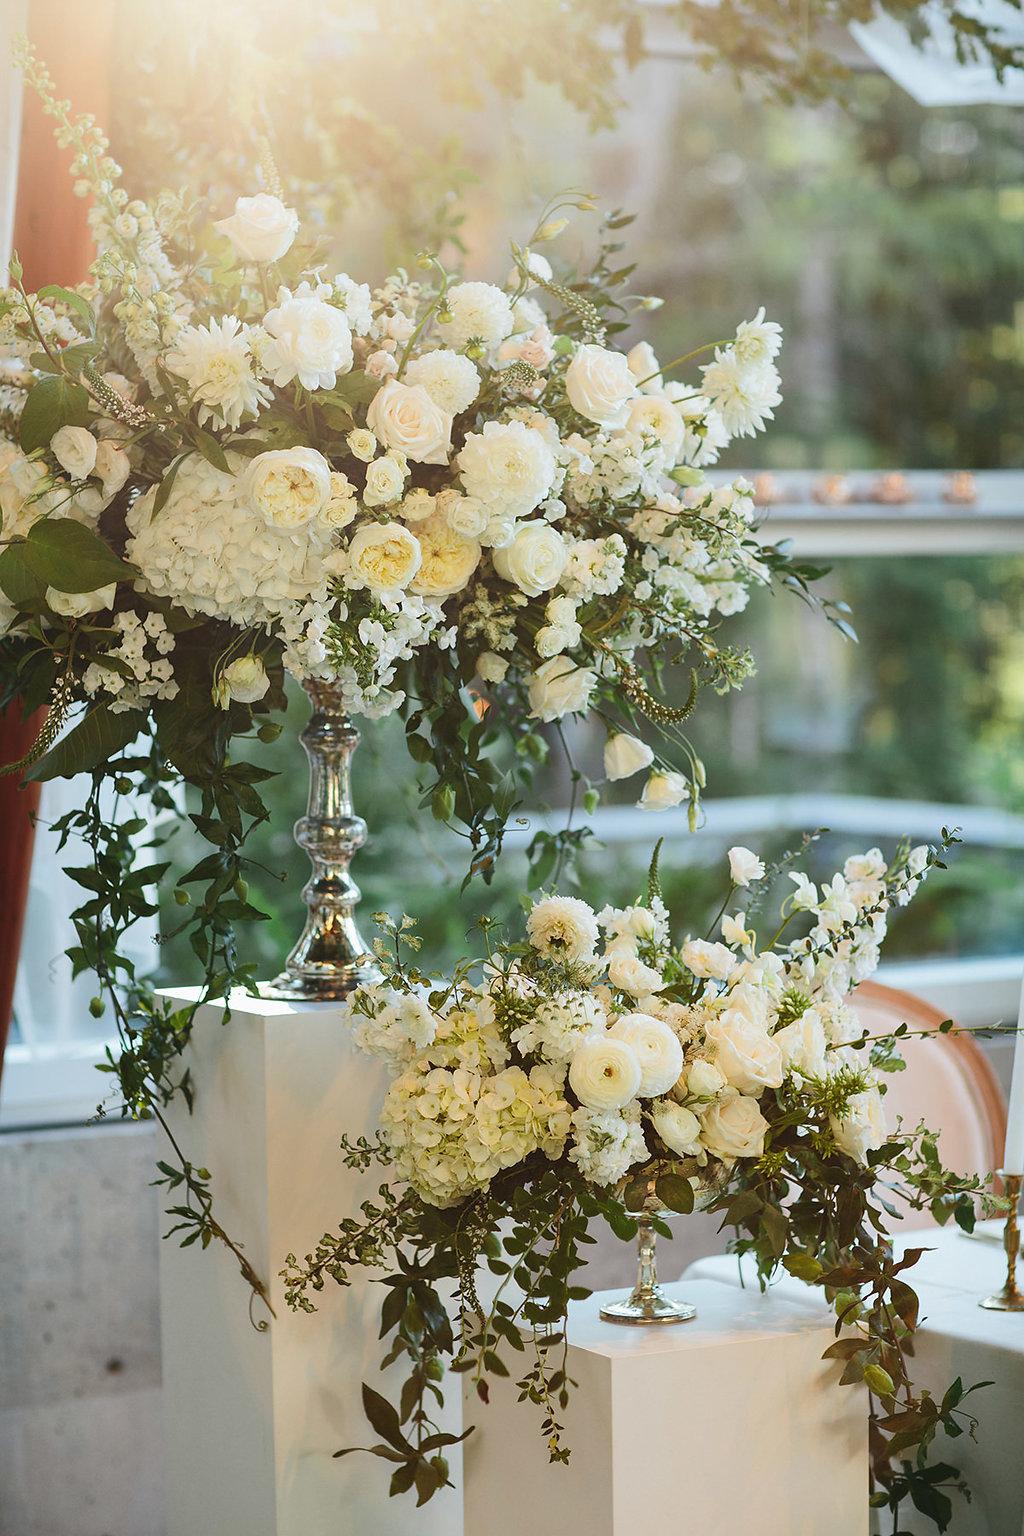 wedding floral inspiration - photo by Melia Lucida http://ruffledblog.com/elegant-canadian-wedding-with-greenery